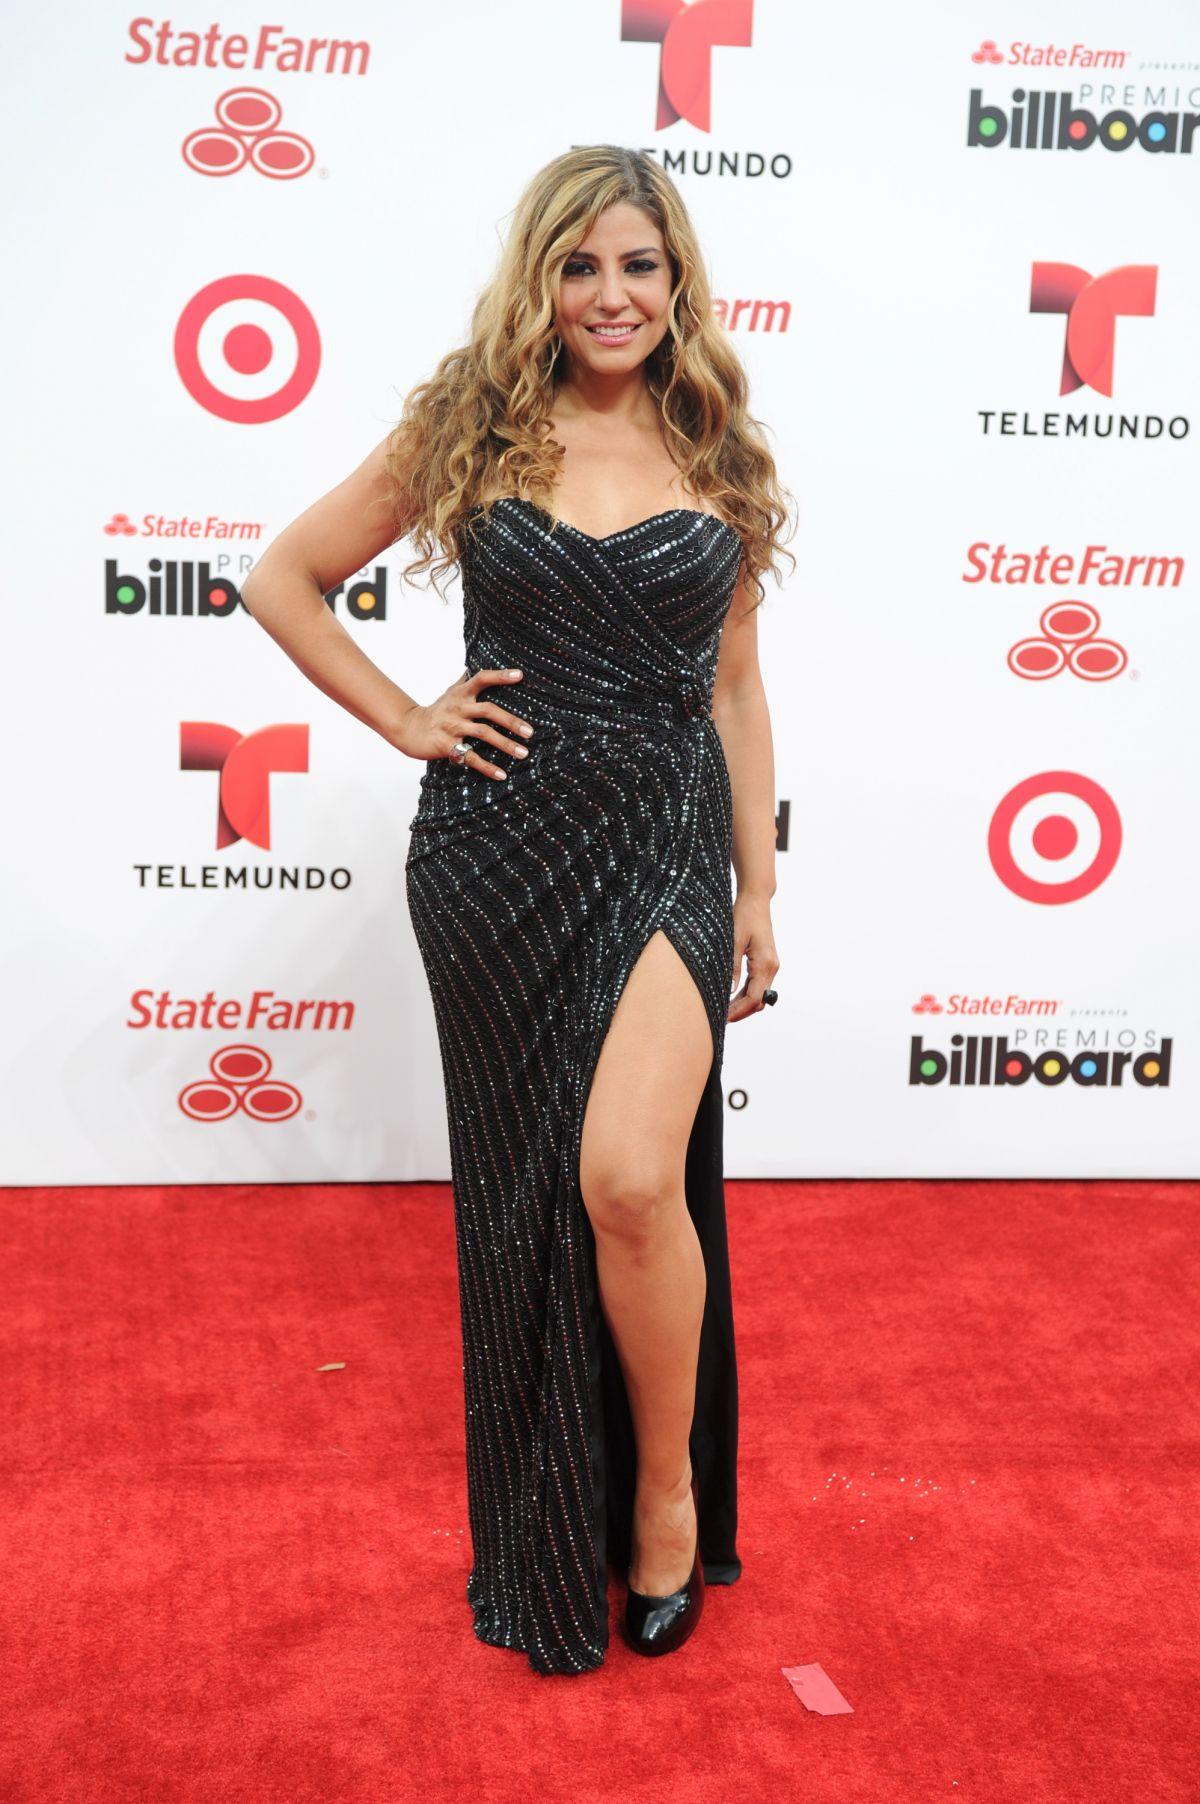 LENA BURKE at 2014 Billboard Latin Music Awards in Miami